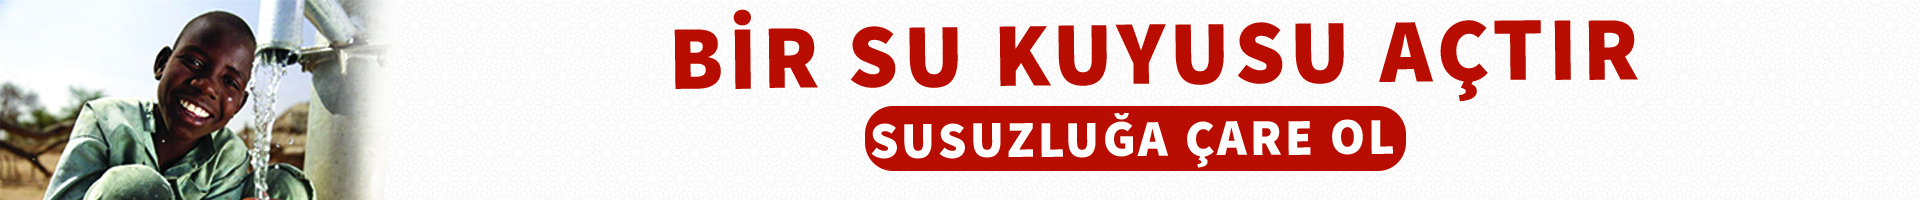 Su Kuyusu